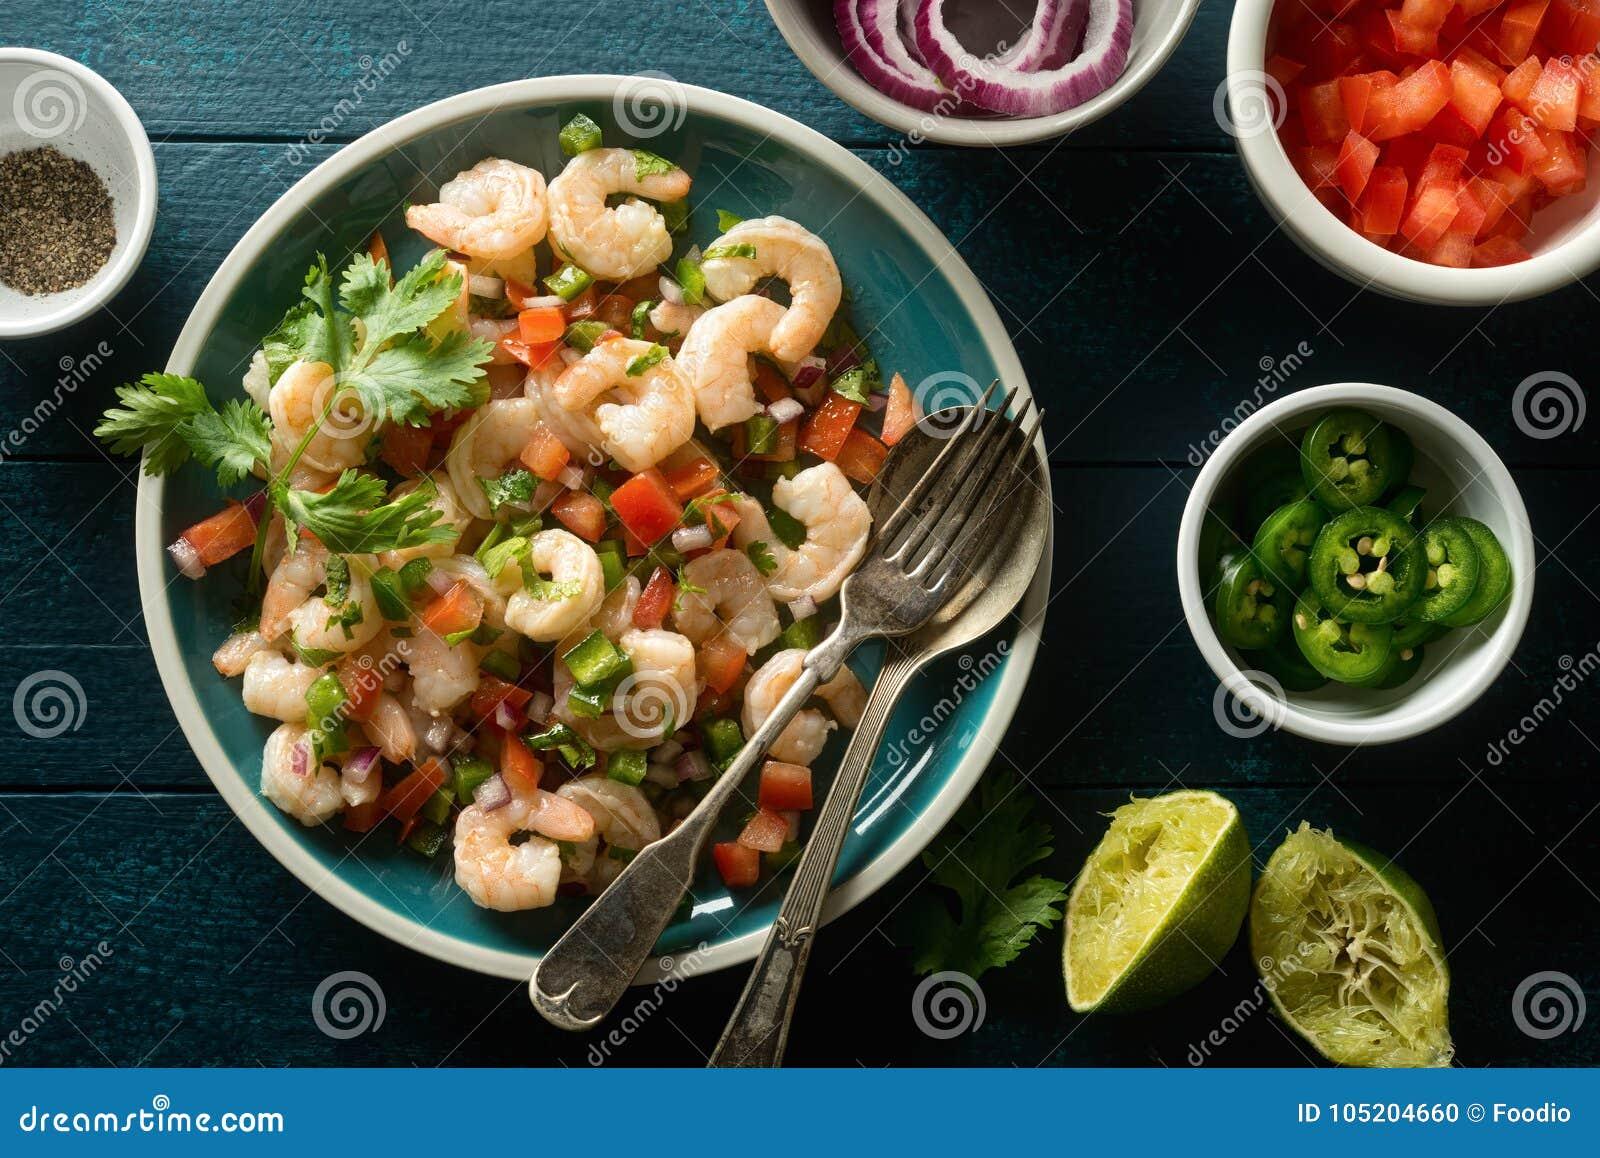 Shrimp Ceviche on a Blue Tabletop